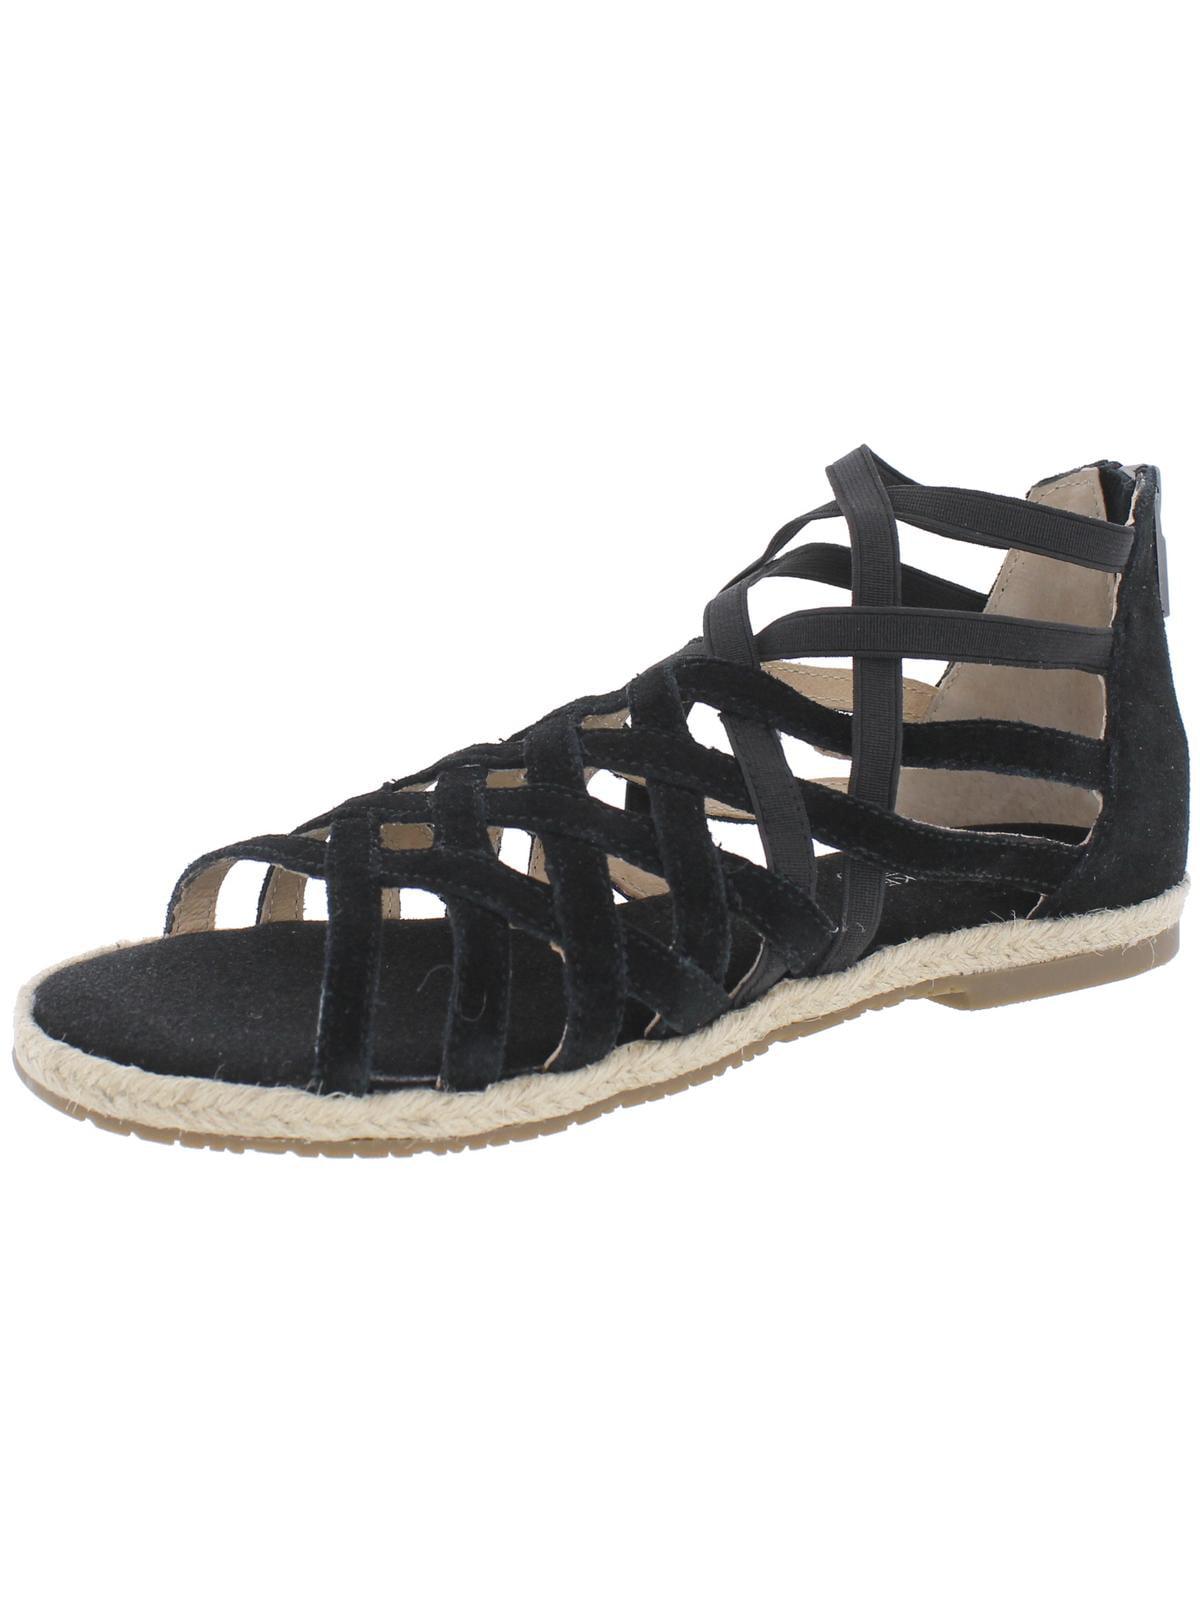 Cason Espadrille Sandals